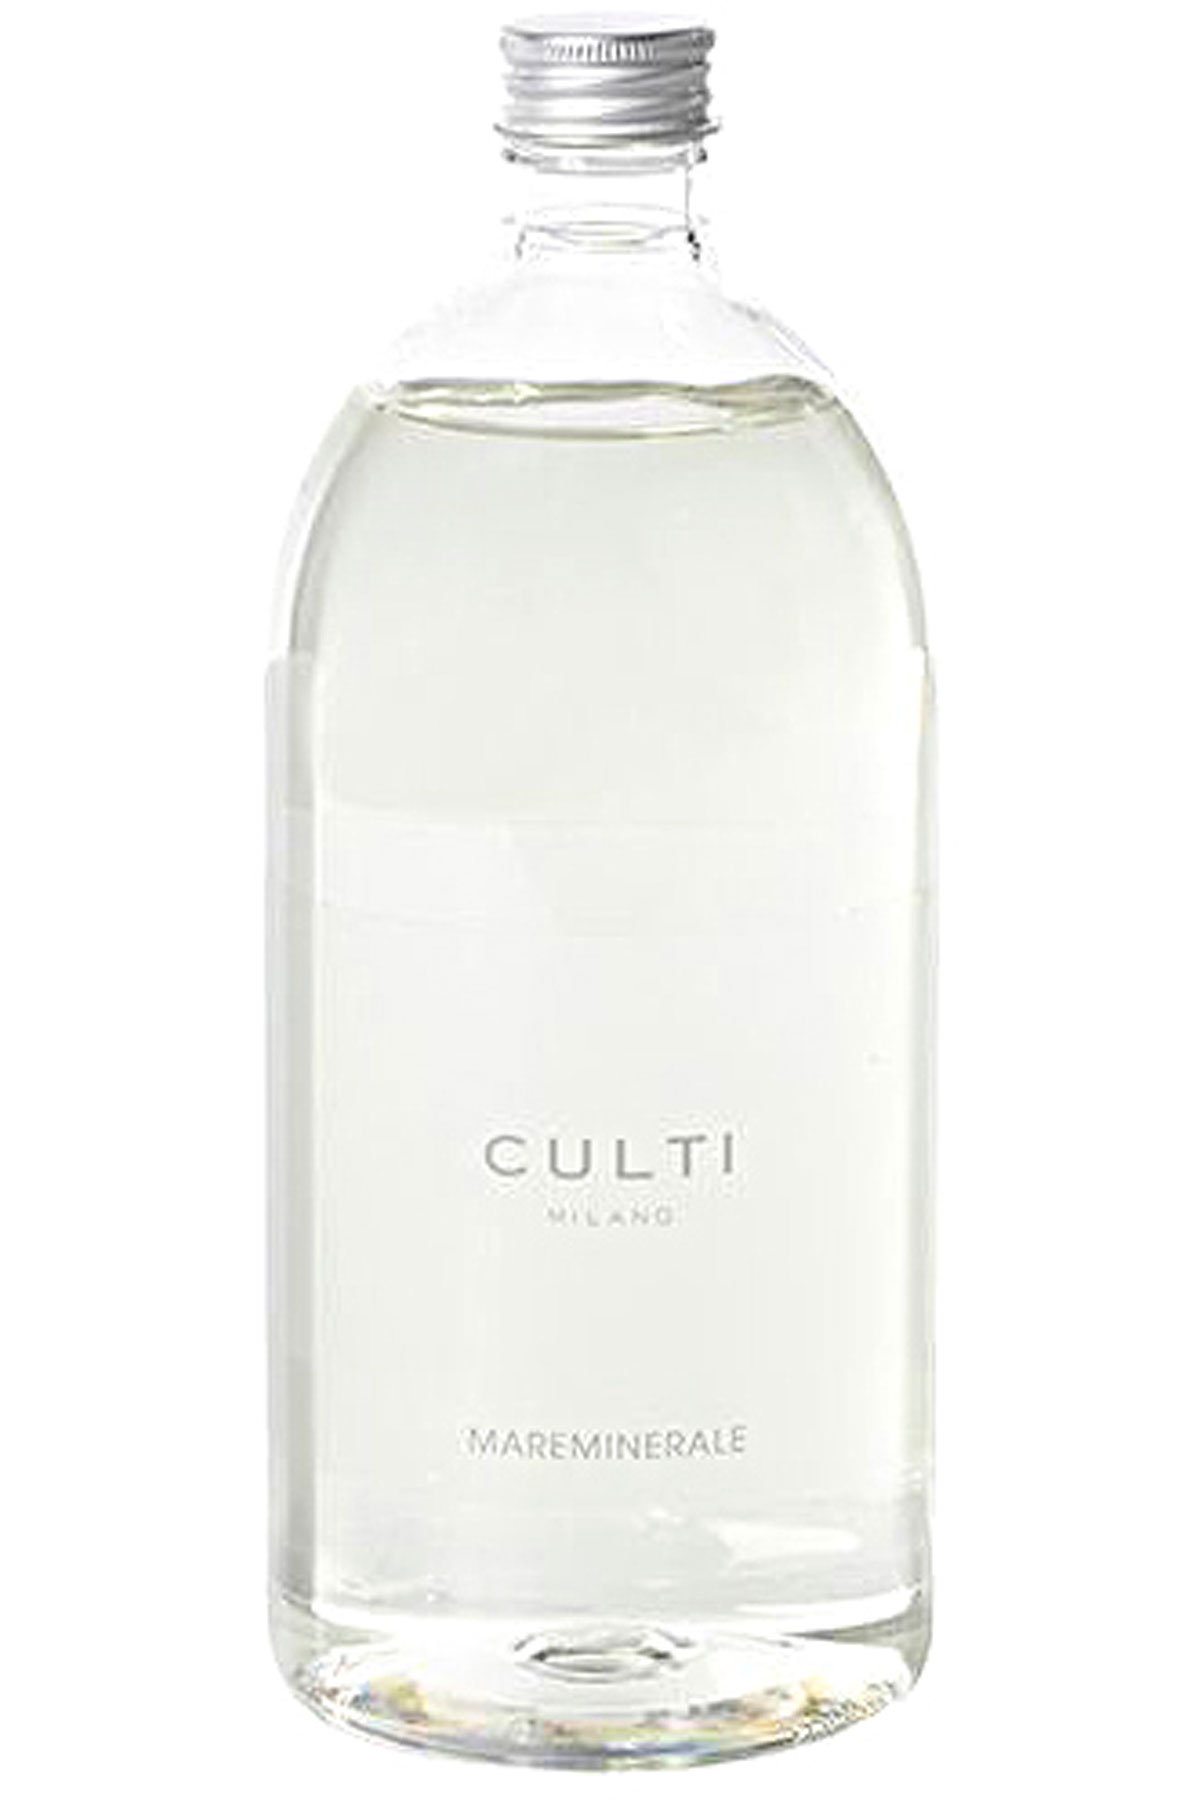 Culti Milano Home Scents for Men On Sale, Refill - Mareminerale - 1000 Ml, 2019, 1000 ml